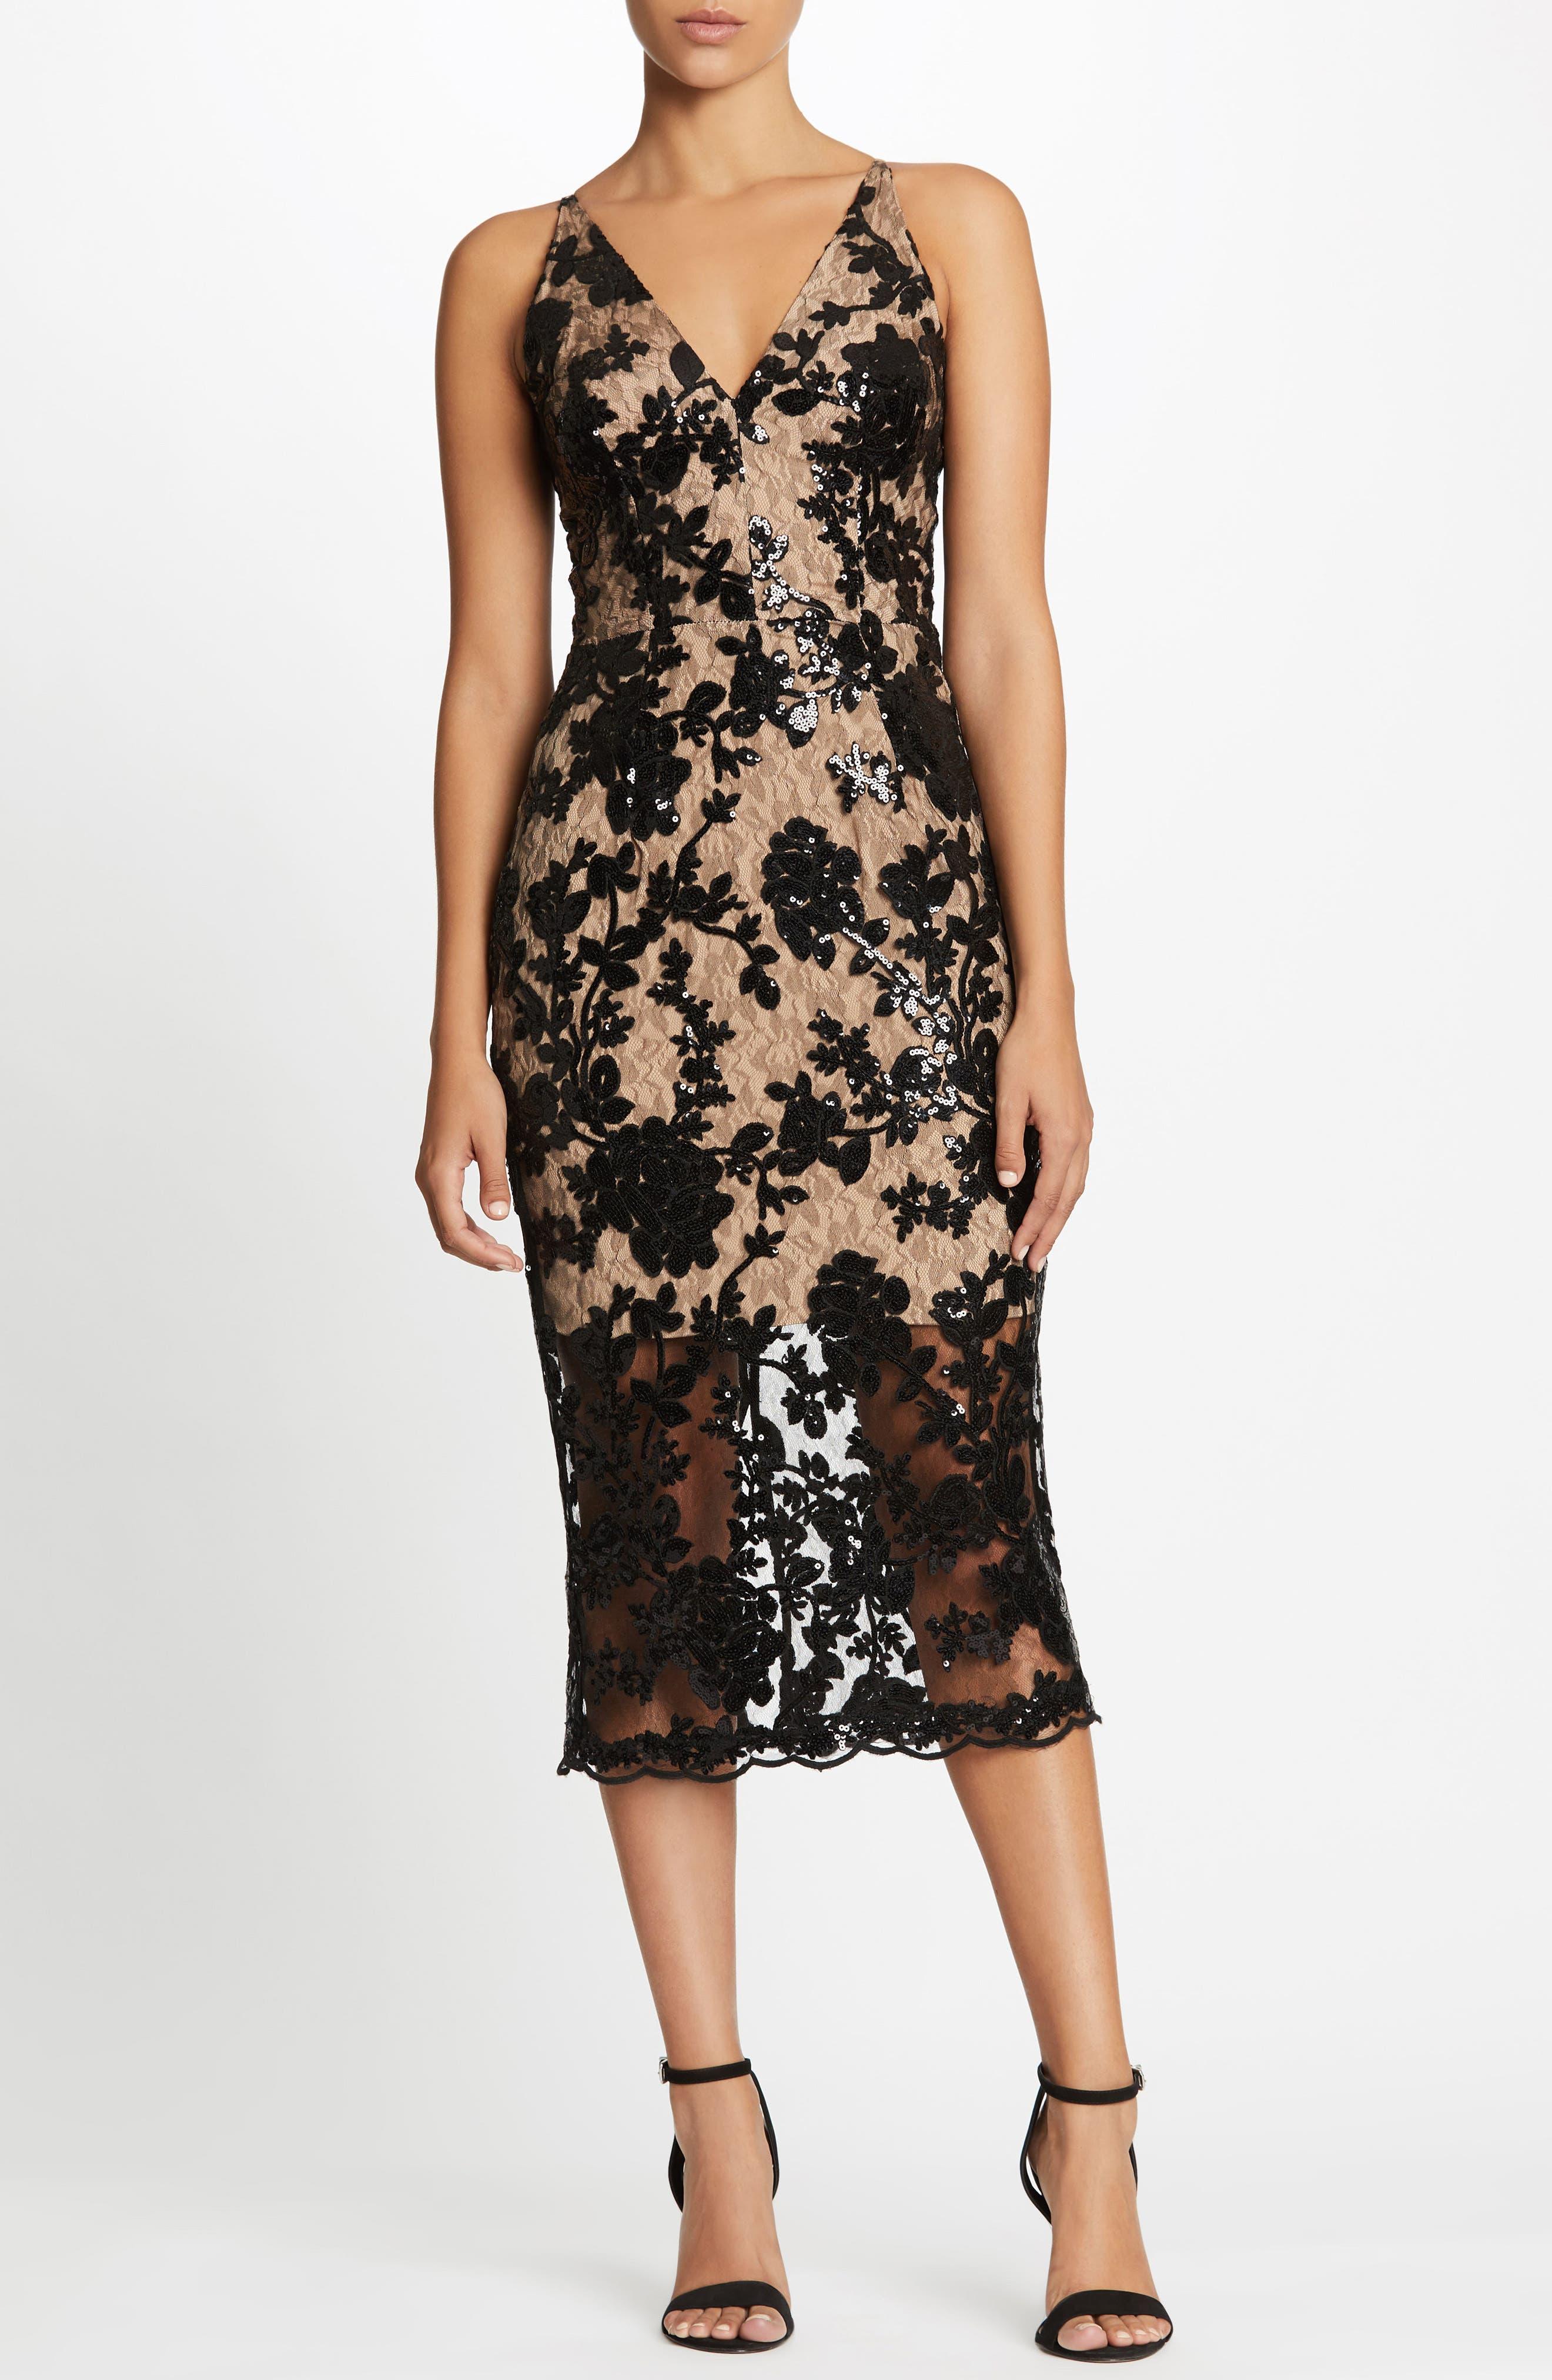 Rebecca Floral Lace Midi Dress,                             Main thumbnail 1, color,